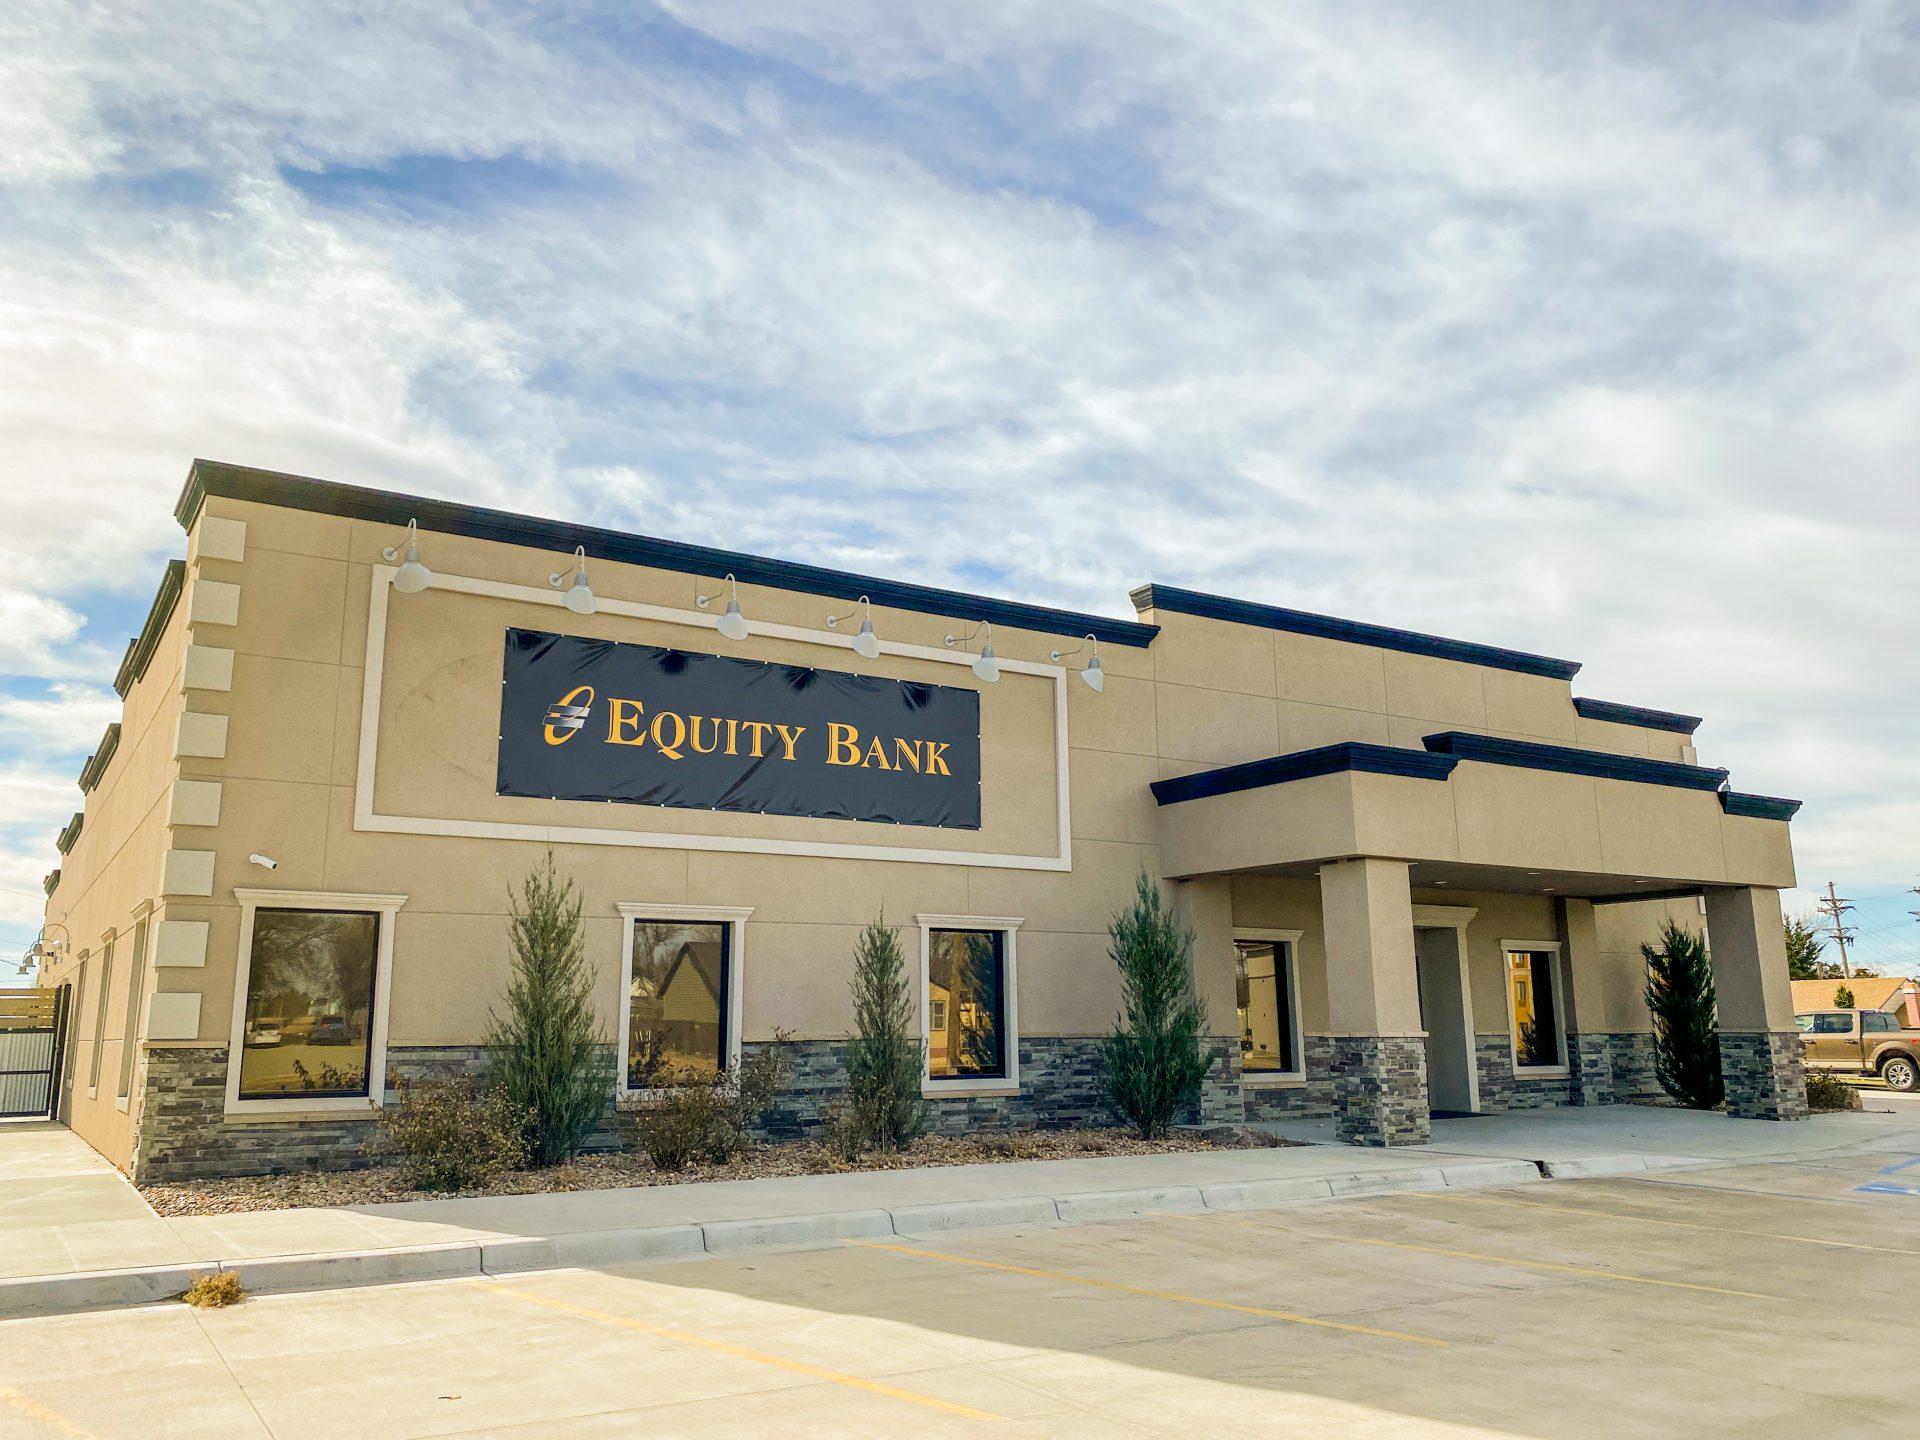 Equity Bank Norton branch exterior.